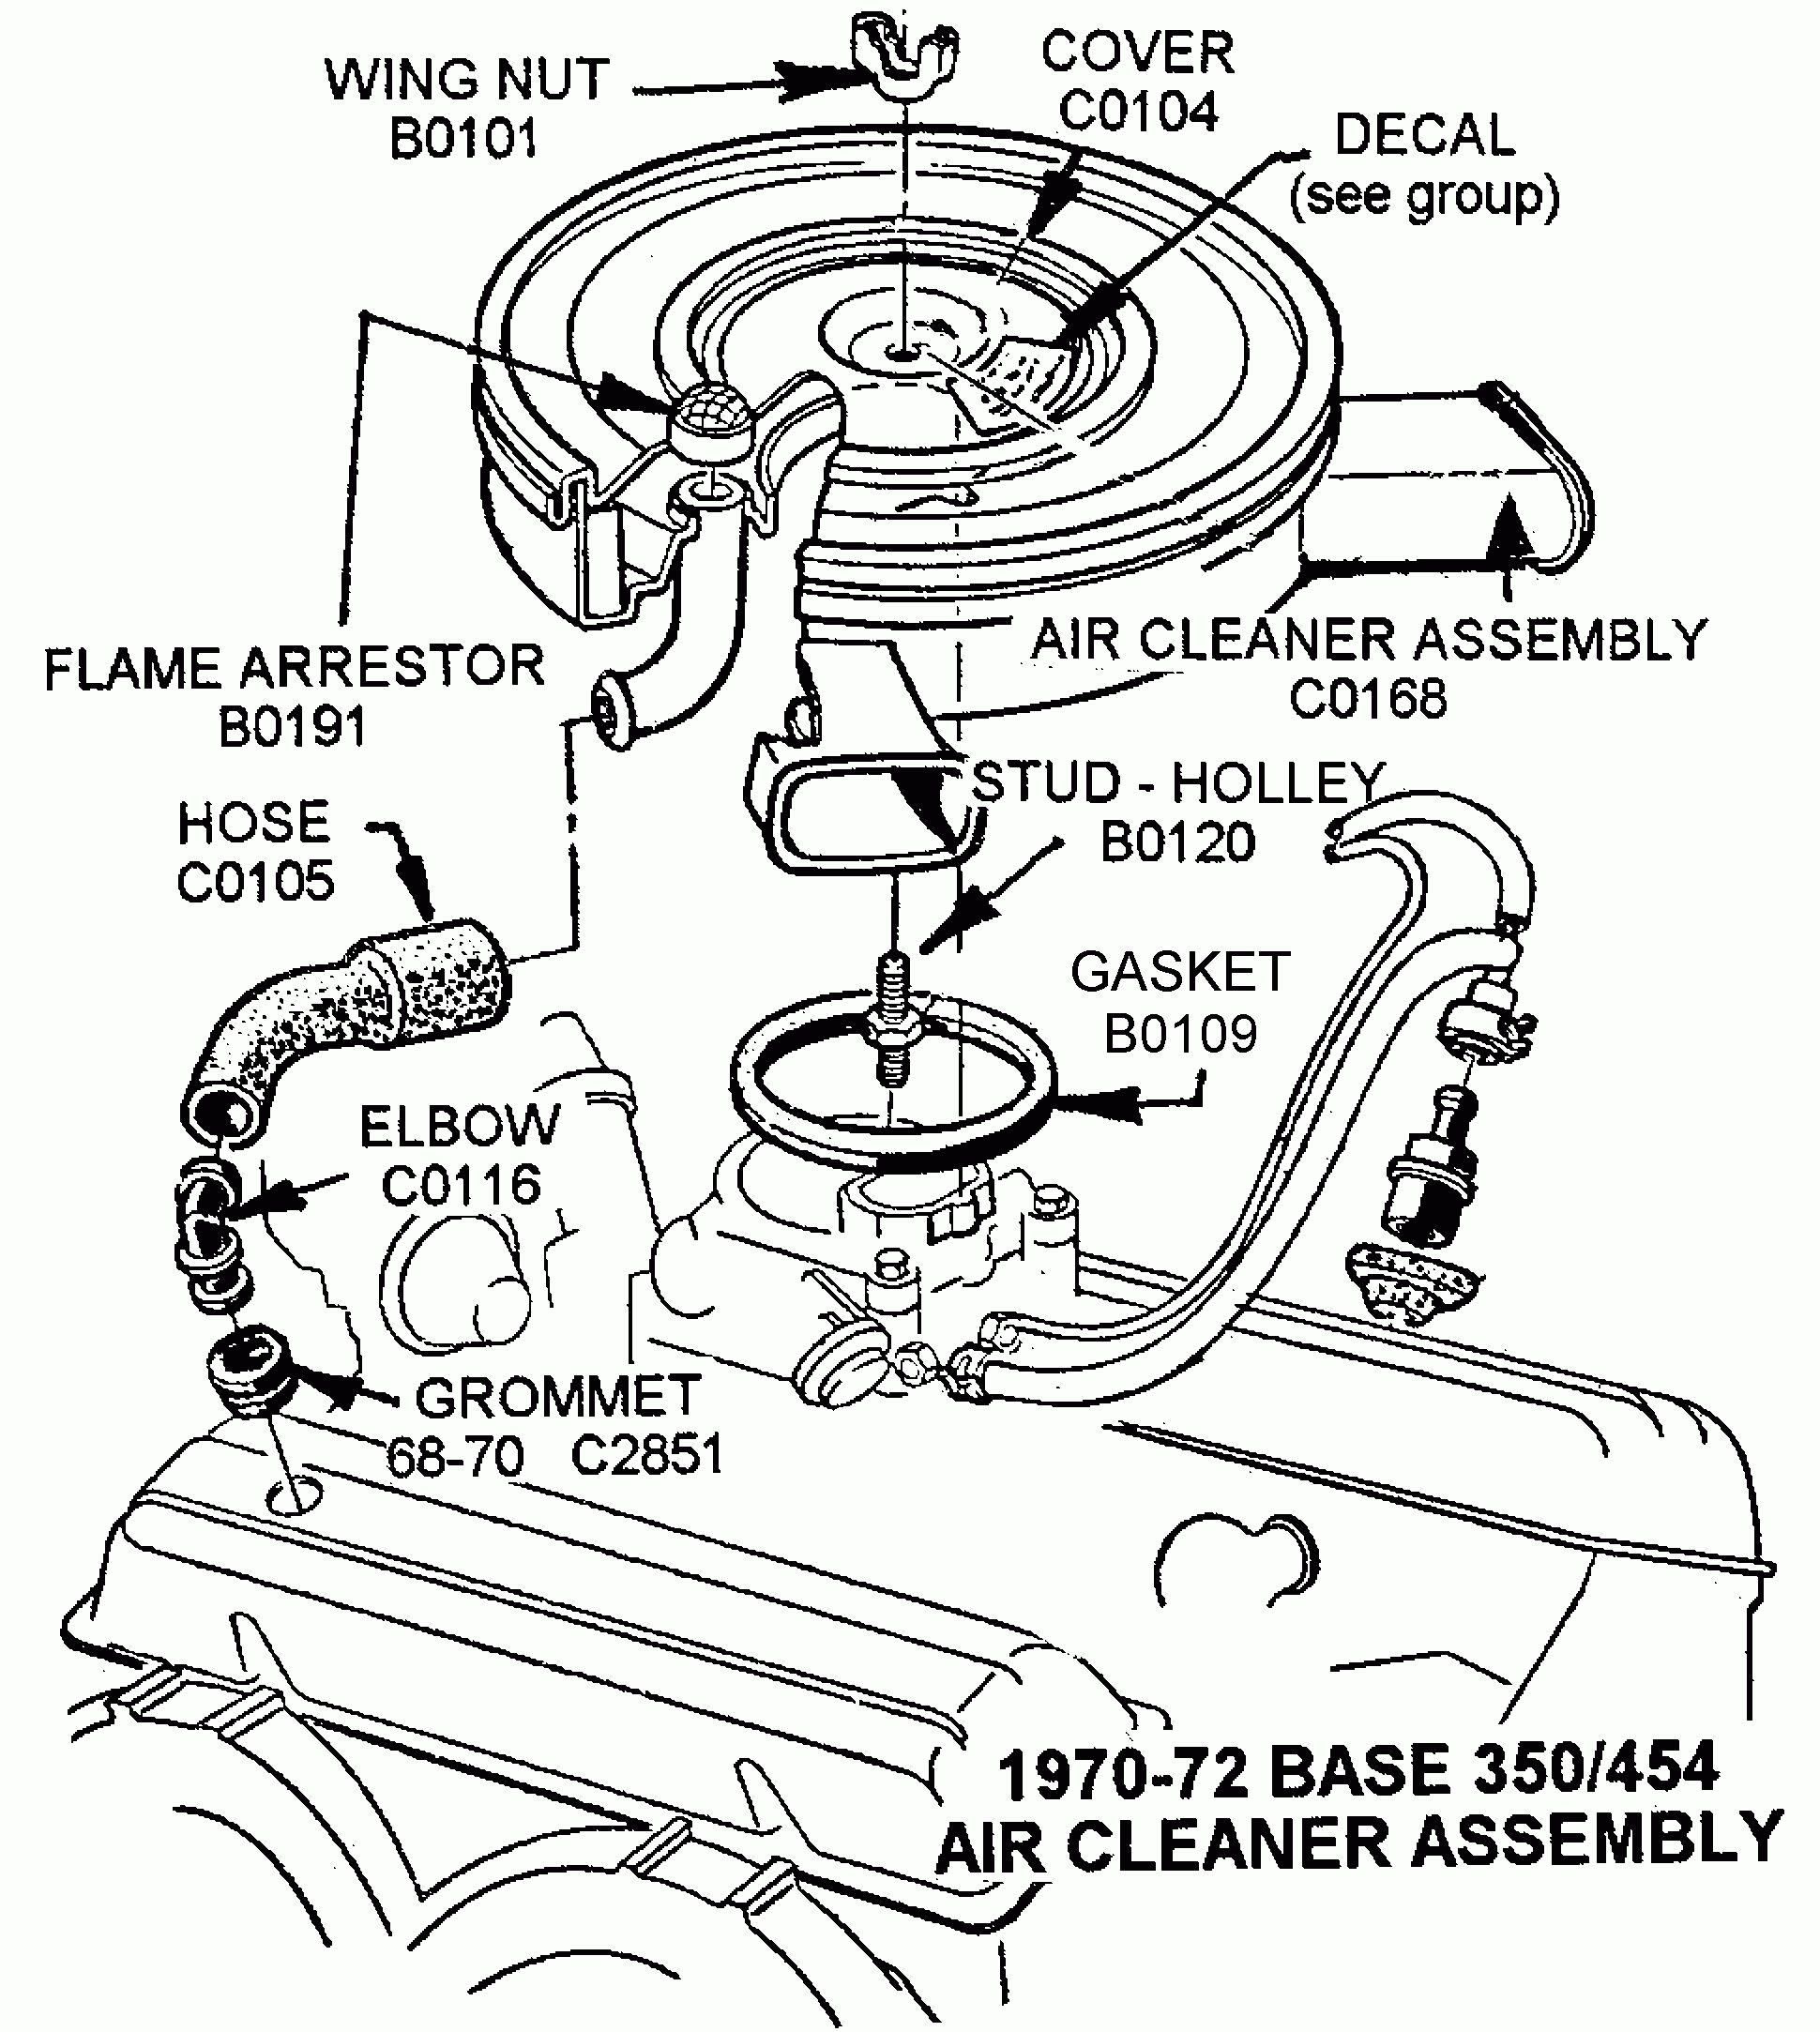 WIRING 1988 Chevy 454 Truck Engine Diagram FULL Version HD Quality Engine  Diagram - OKCWEBDESIGNER.KINGGO.FRokcwebdesigner kinggo fr